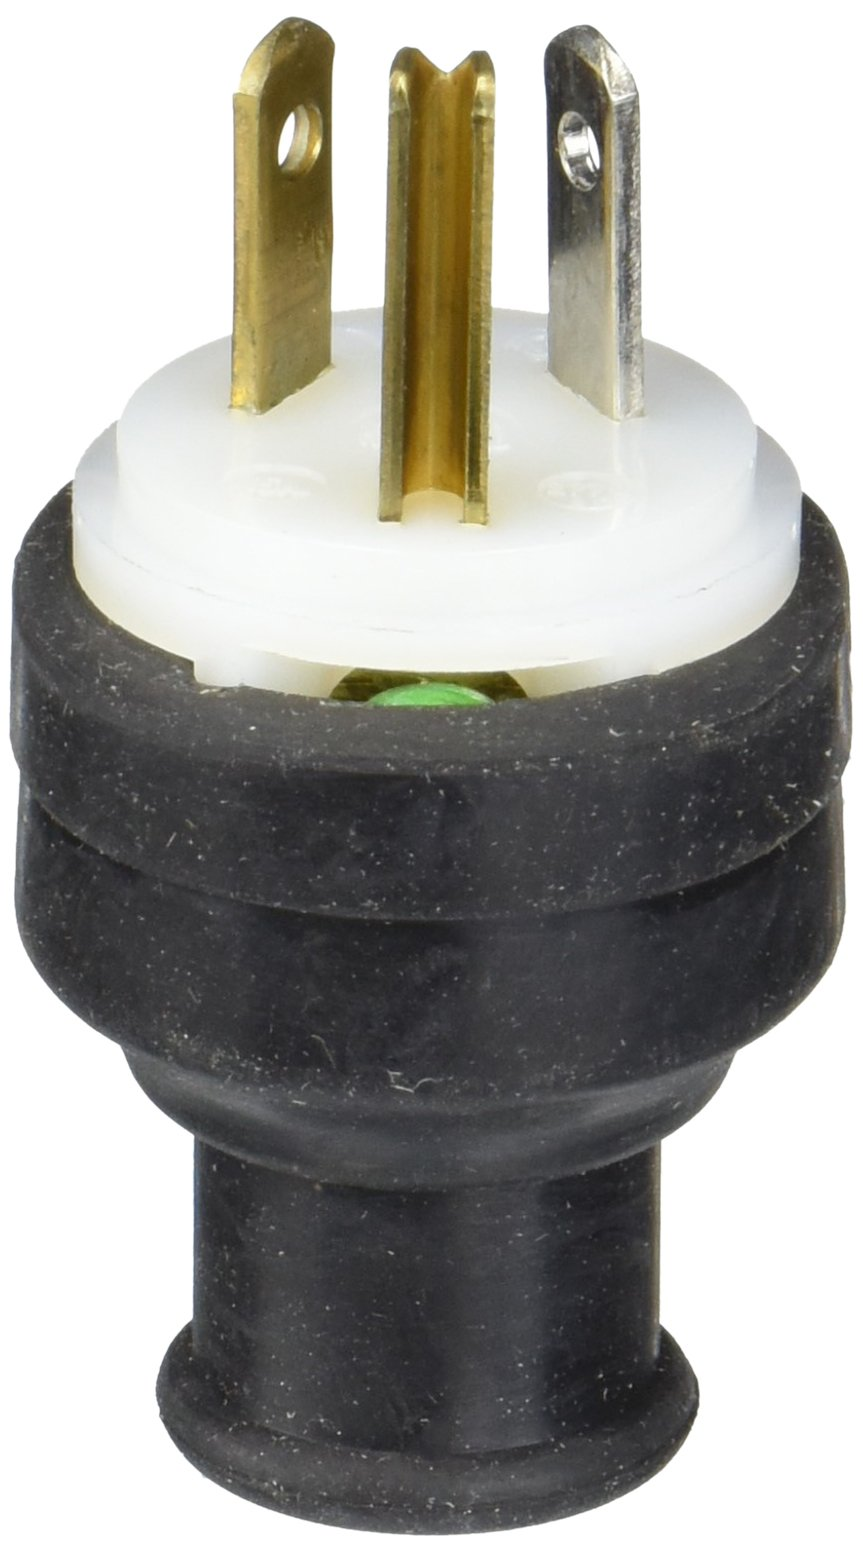 Hubbell HBL5929 Plug, 15 amp, 277V, Nema 7-15P